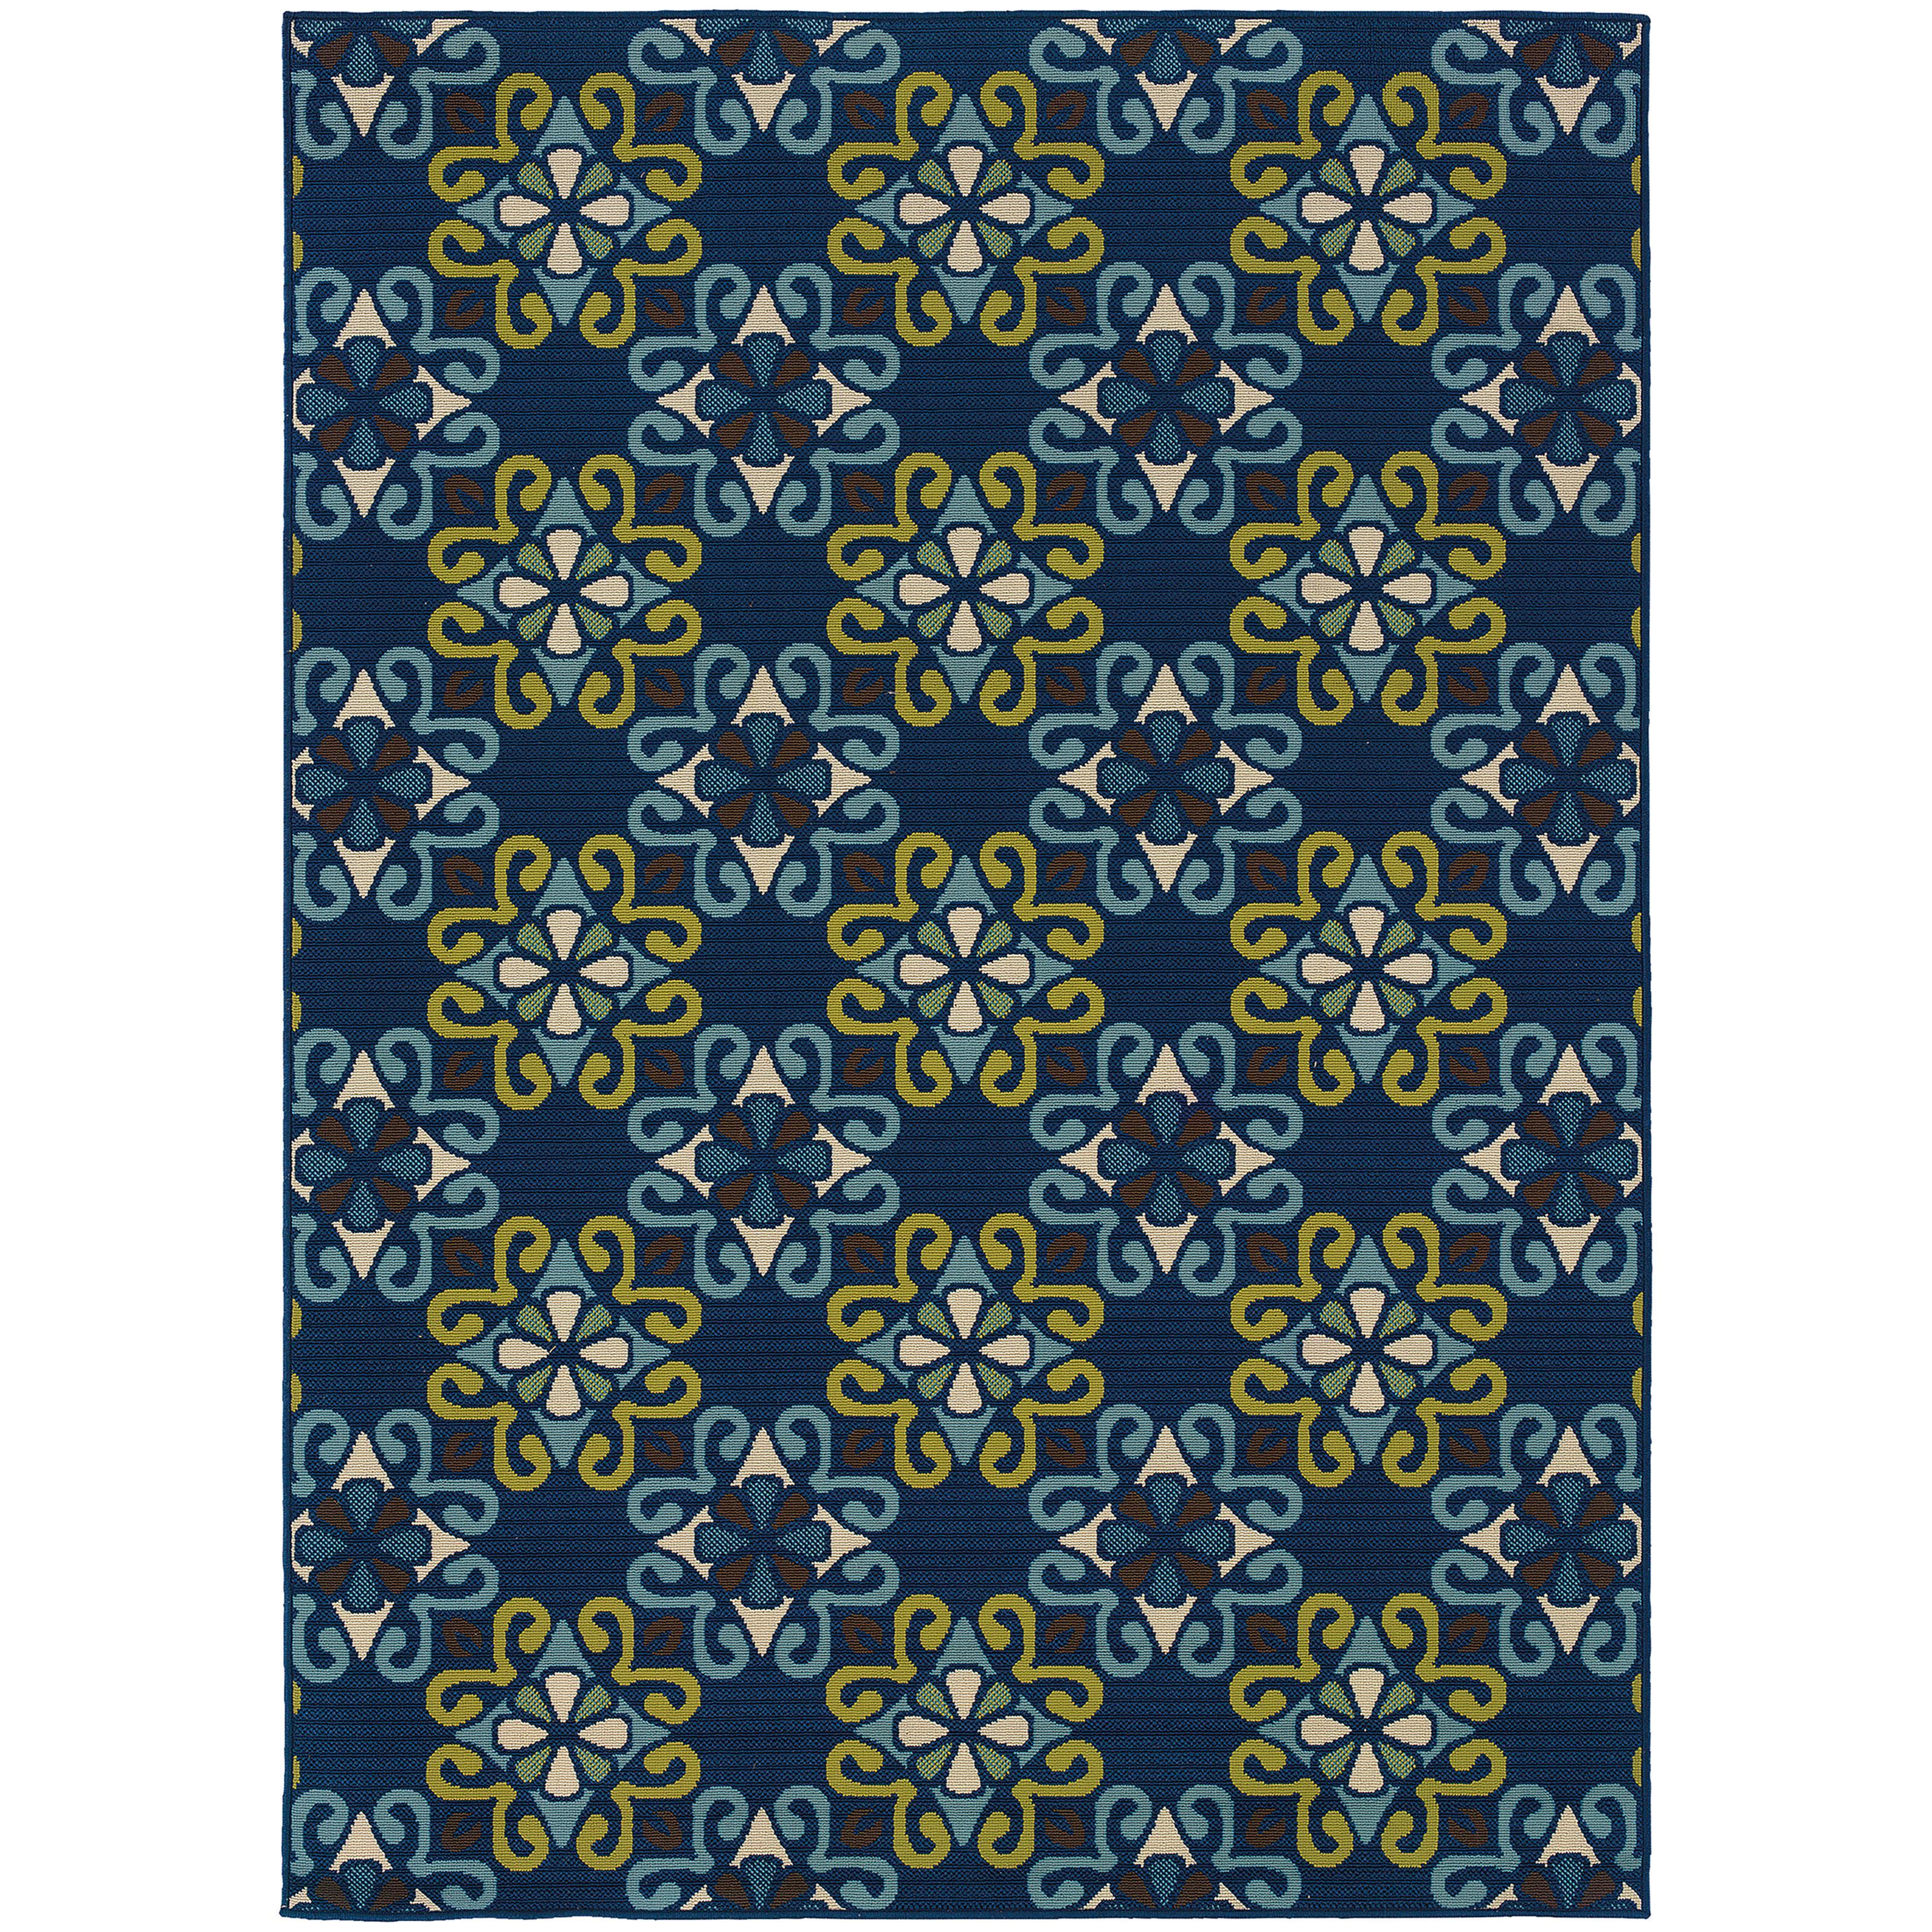 "Caspian 5' 3"" X  7' 6"" Rug by Oriental Weavers at Darvin Furniture"